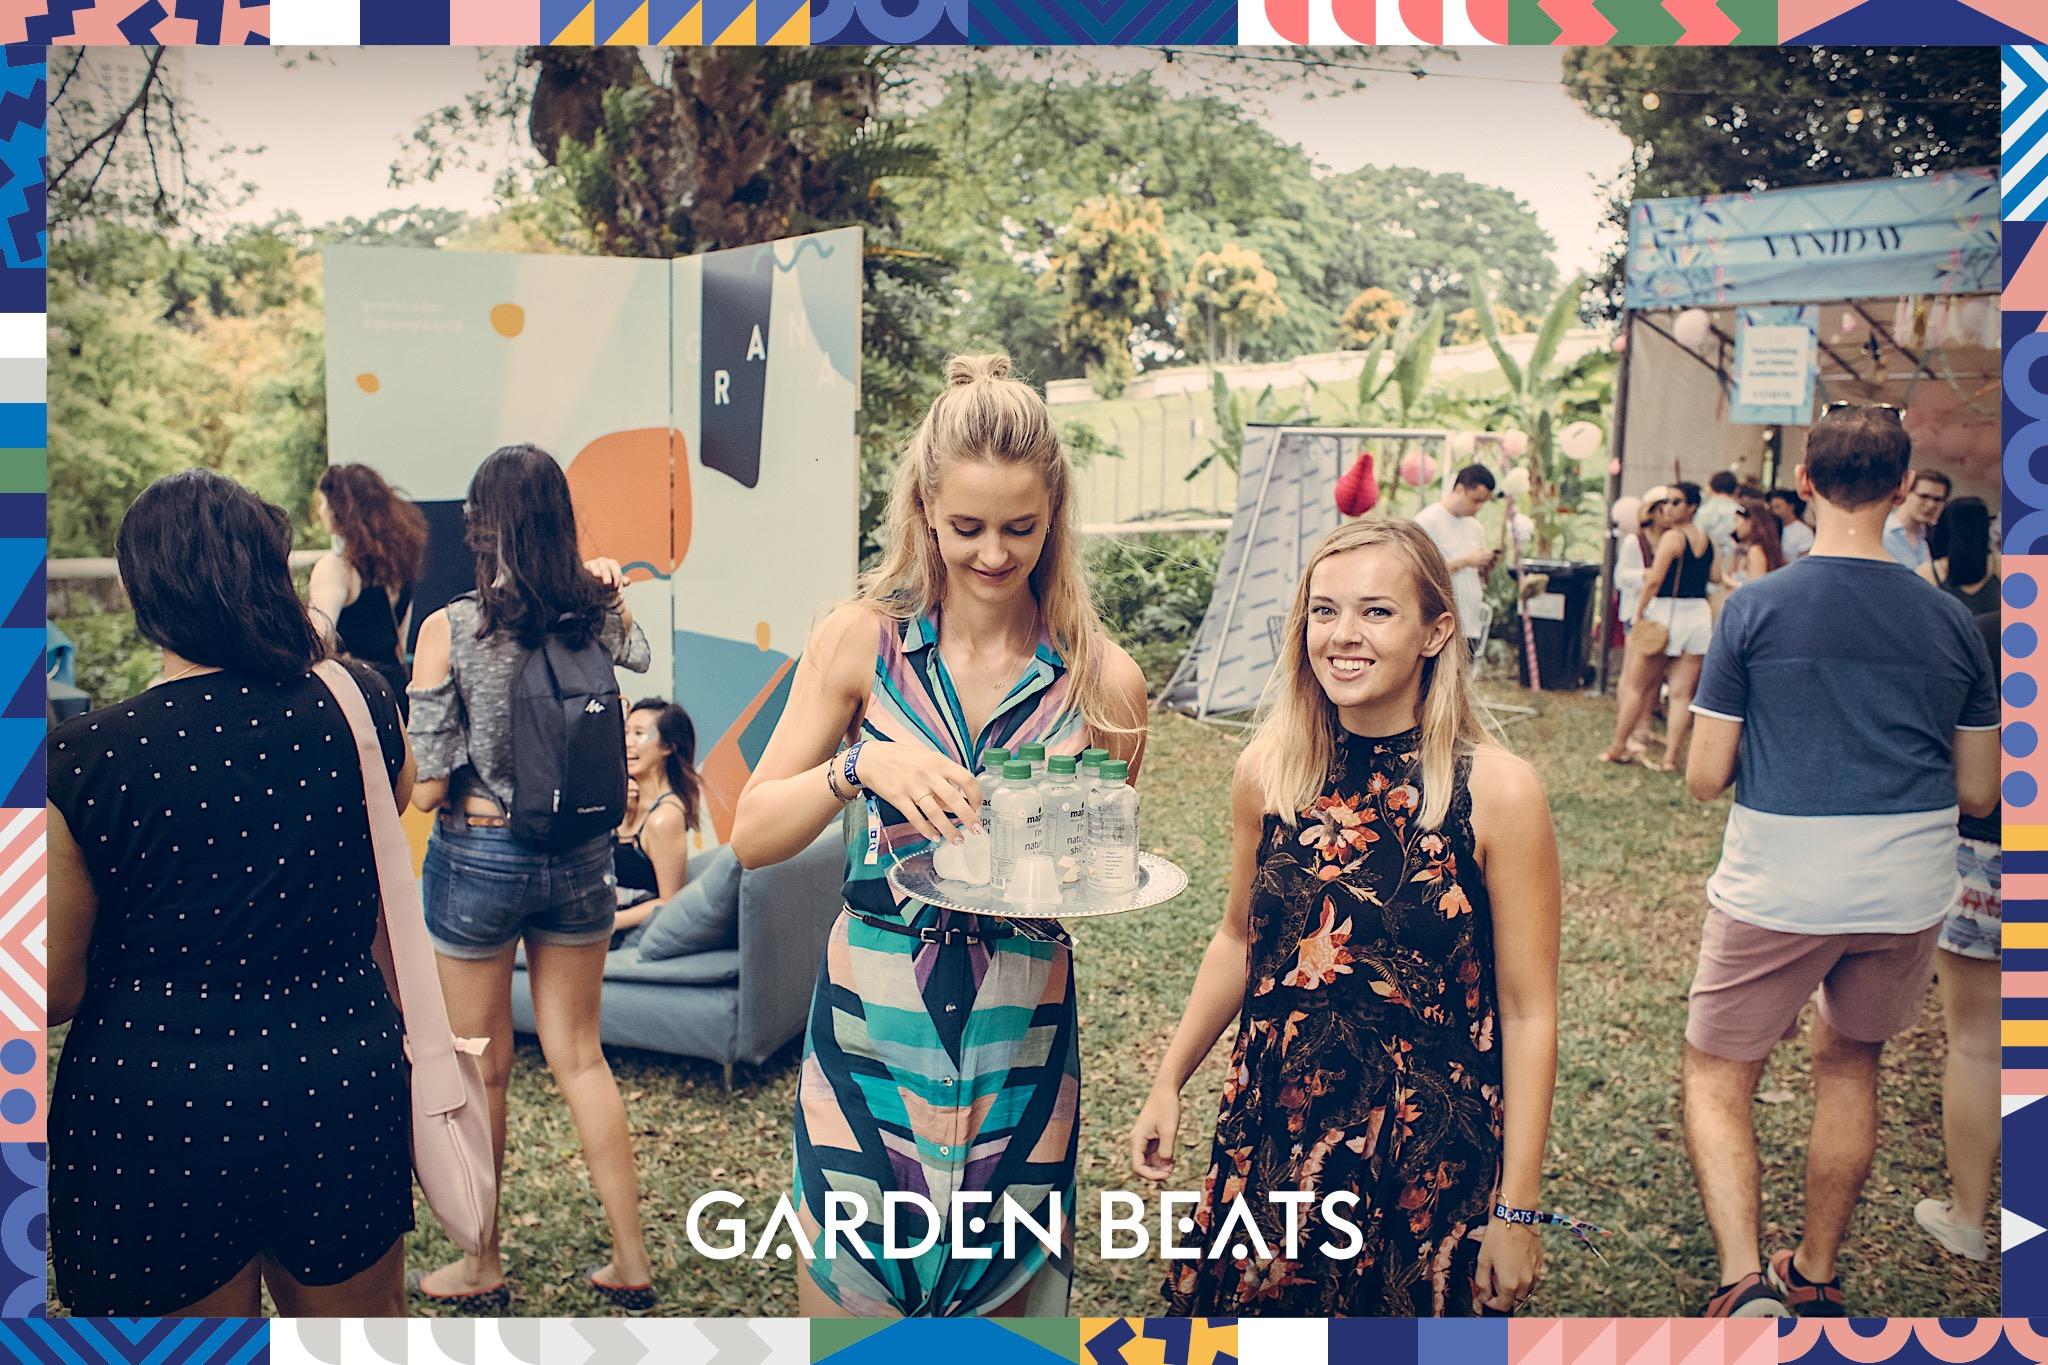 03032018_GardenBeats_Colossal488_Watermarked.jpg